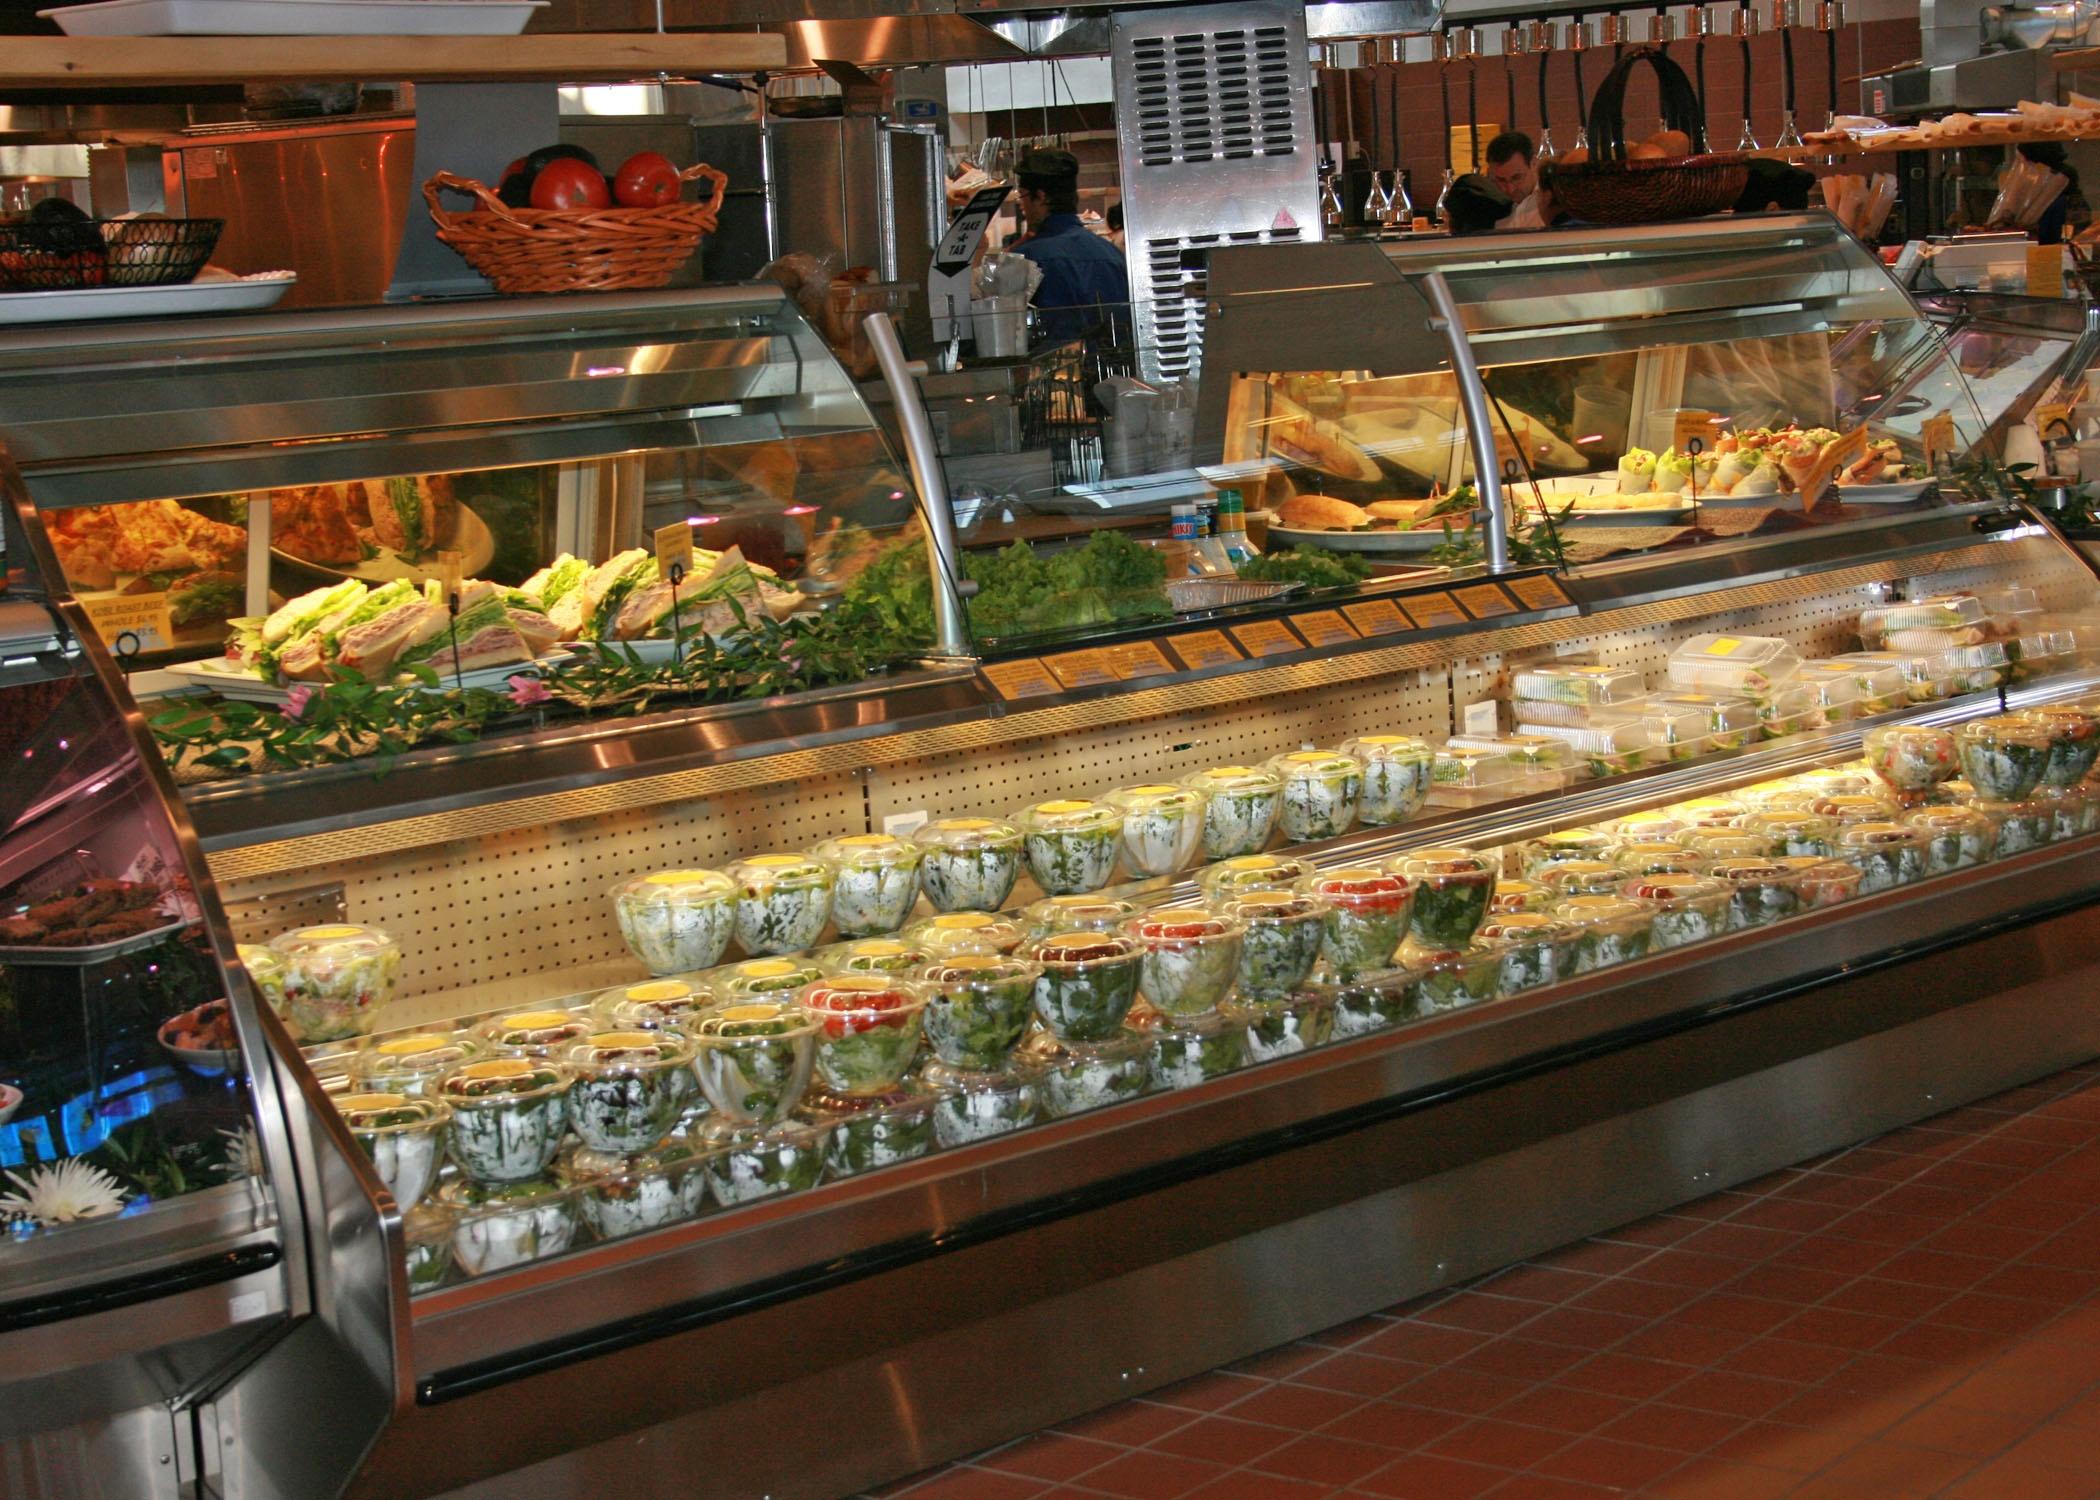 Deli  皇后区 食品便利店  汽车经销商密集的区域